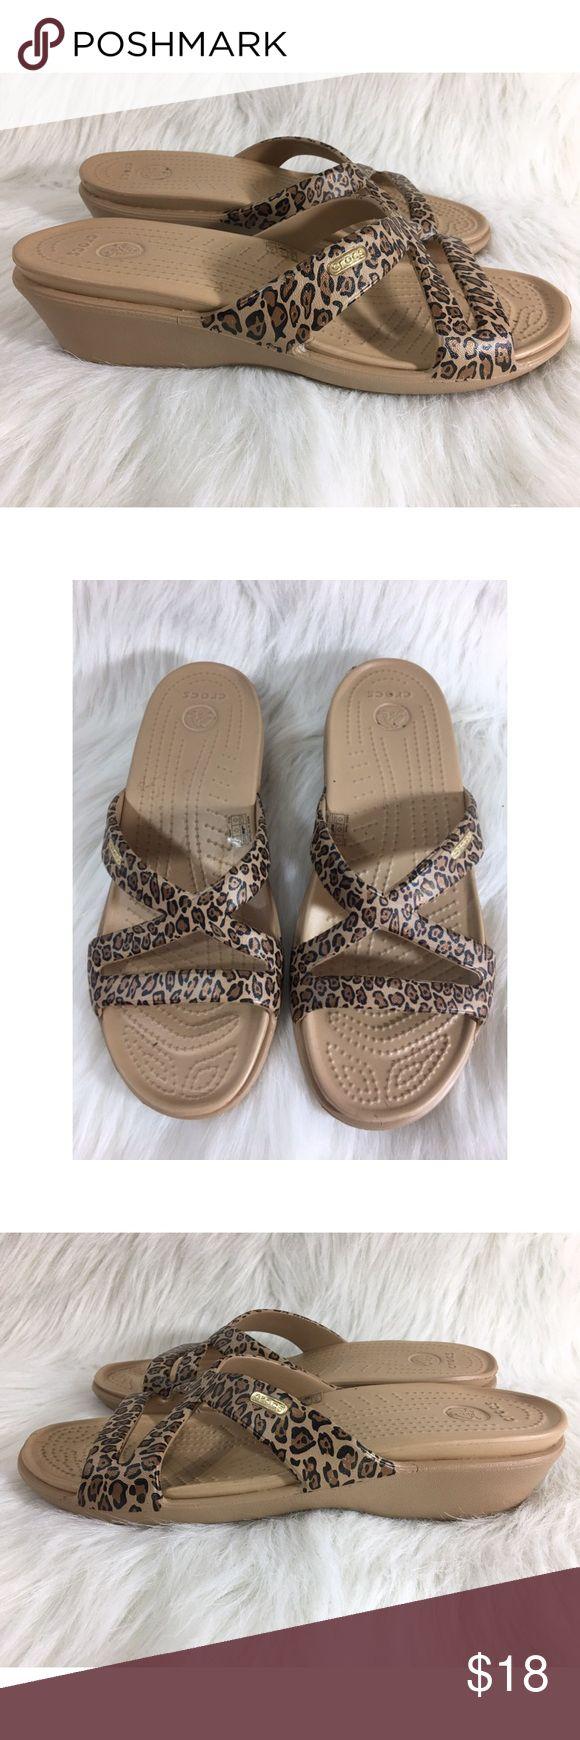 "Crocs Leopard Sandals Size 10 Heel height is 2"" Great condition  011717GW0314 3/2 CROCS Shoes Sandals"